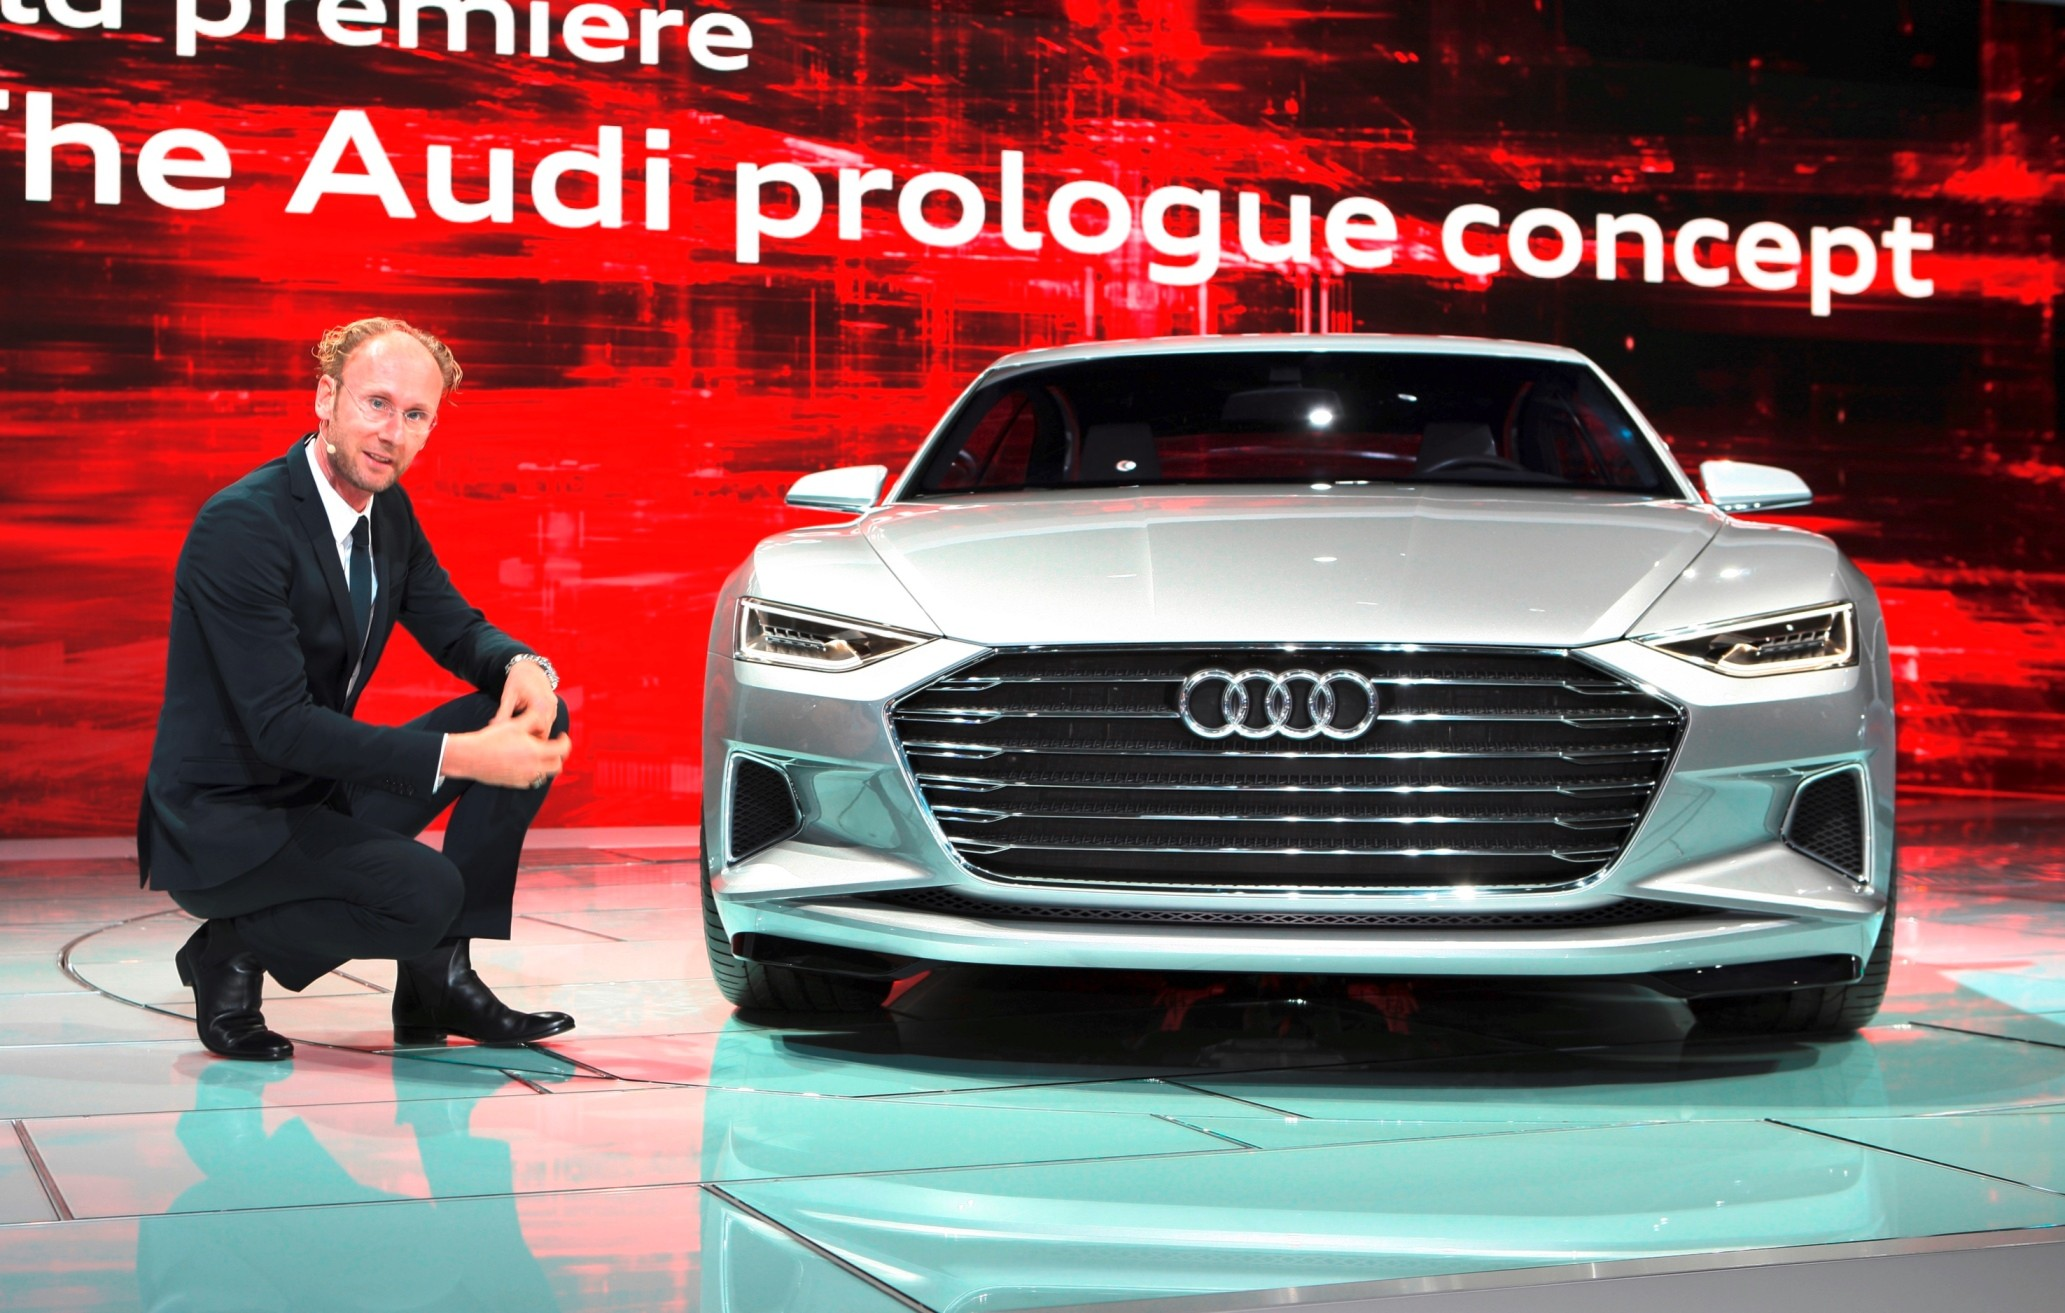 2014 Audi Prologue is Worst of LA 2014 33